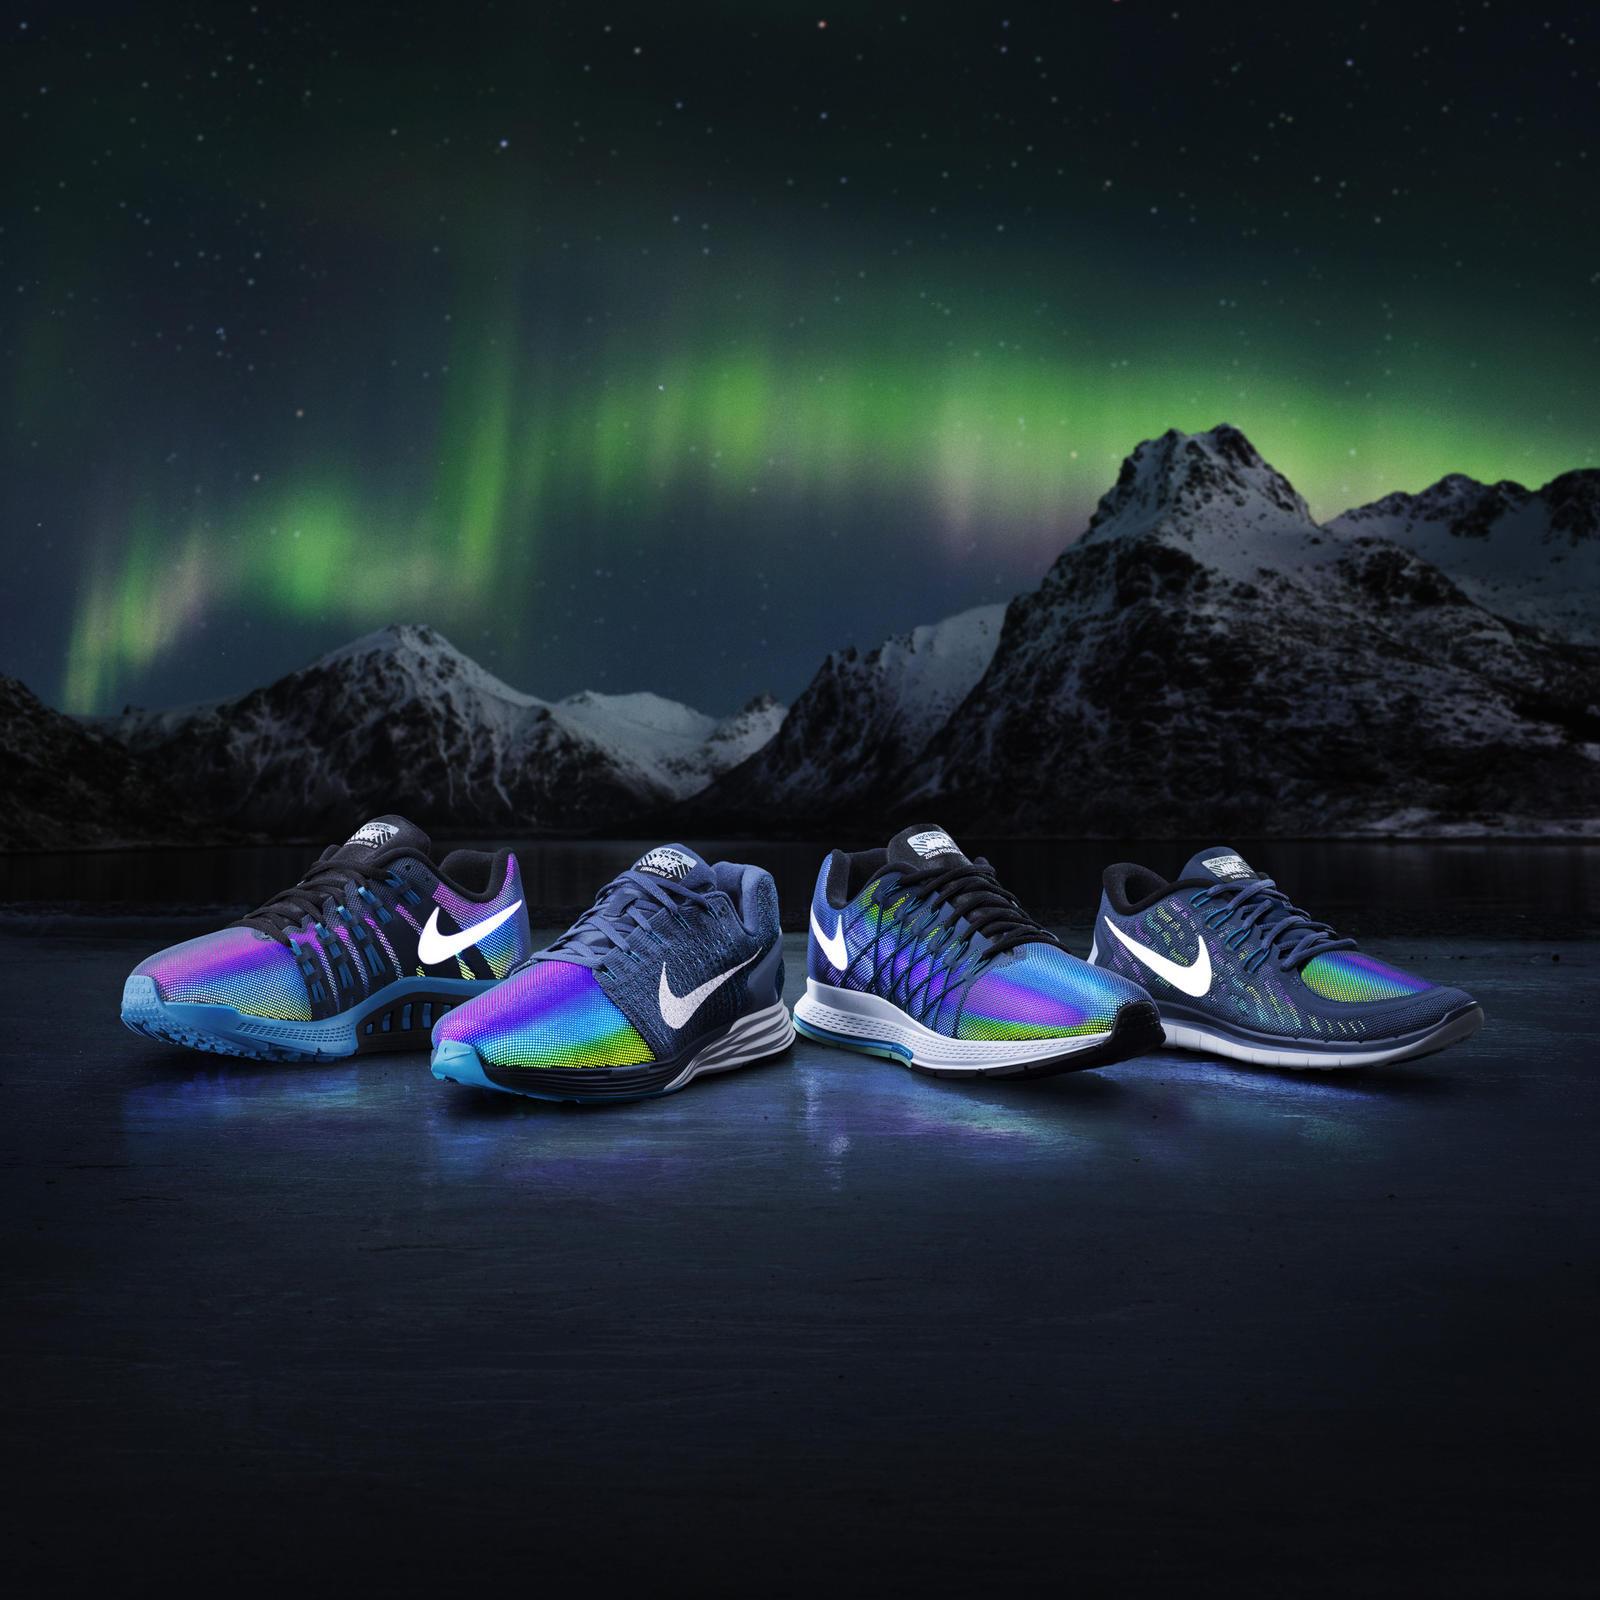 Nike_Flash_Footwear_Family_Mens_native_1600